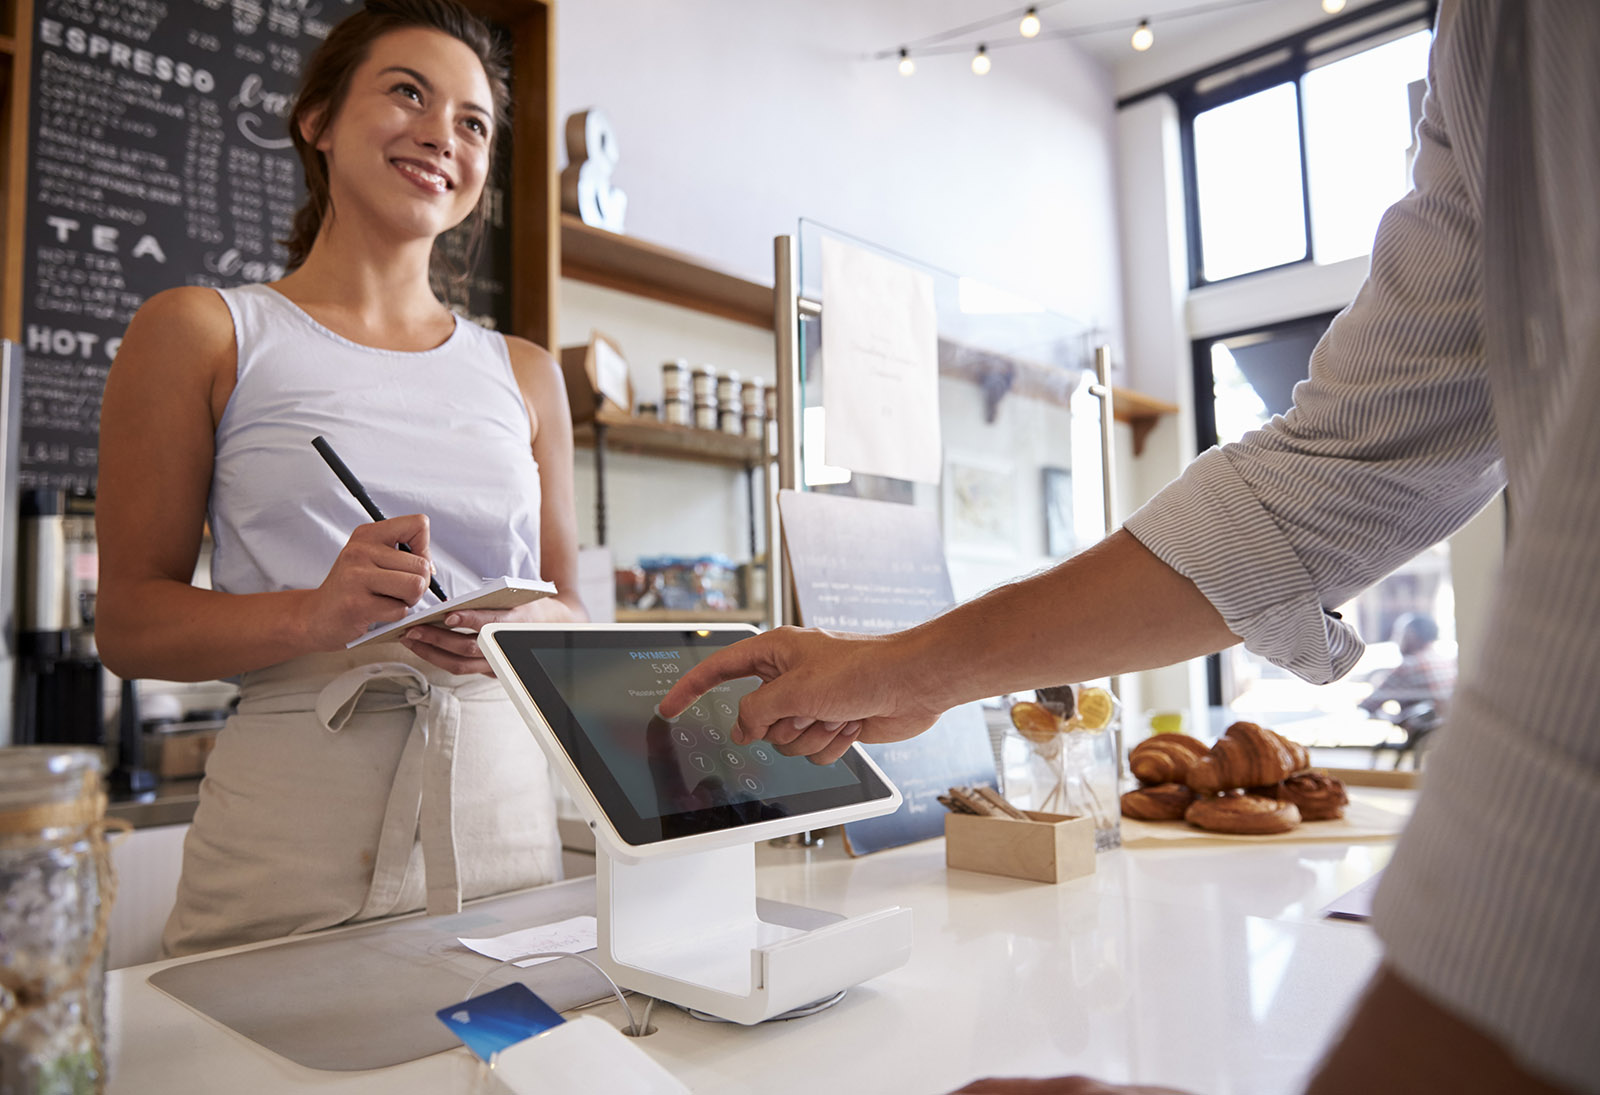 navidor-merchant-services-solutions-paiements-2-3.